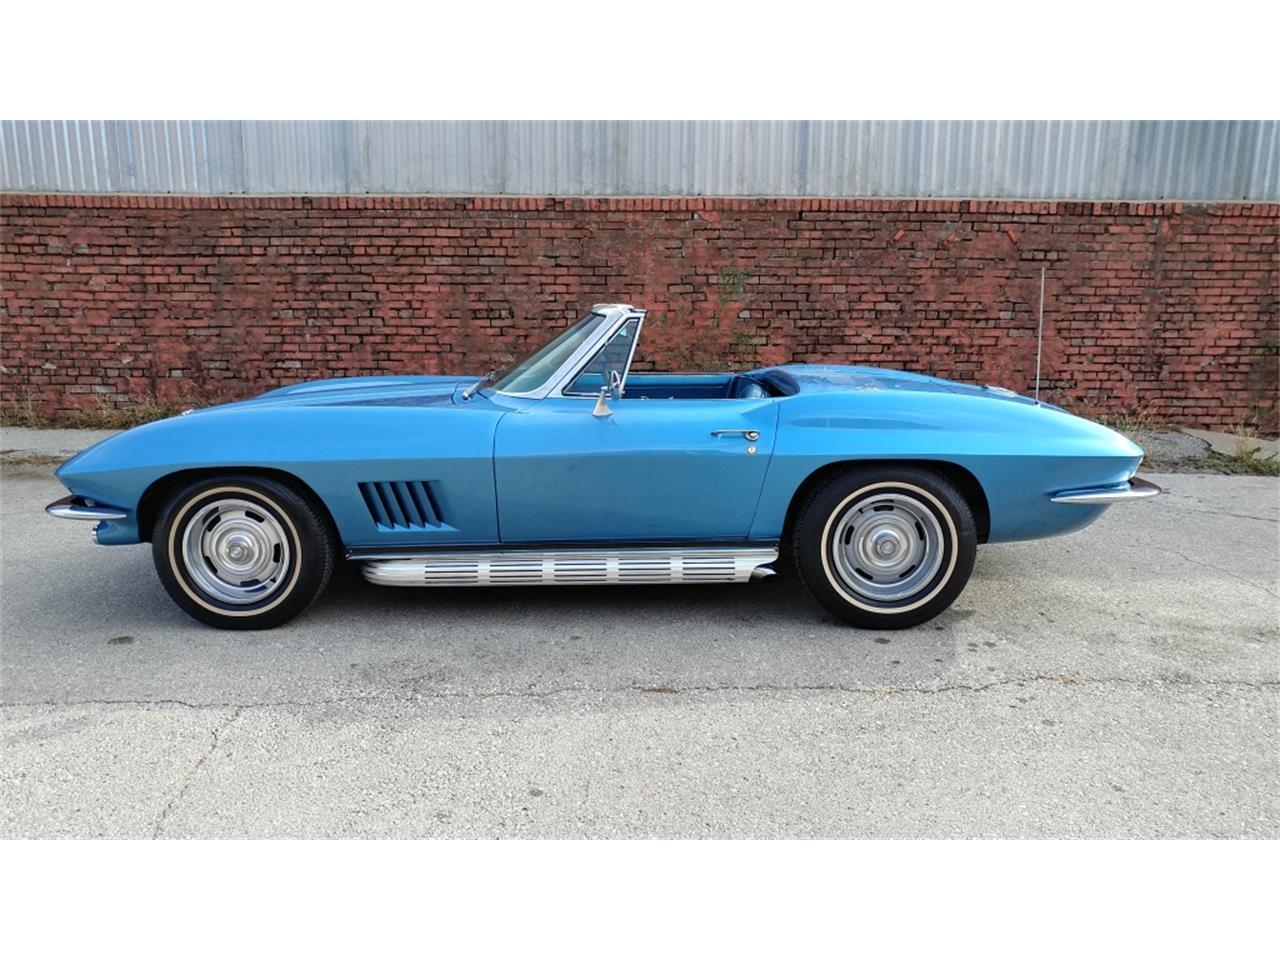 Large Picture of Classic '67 Chevrolet Corvette located in Missouri - $69,500.00 - MO2L